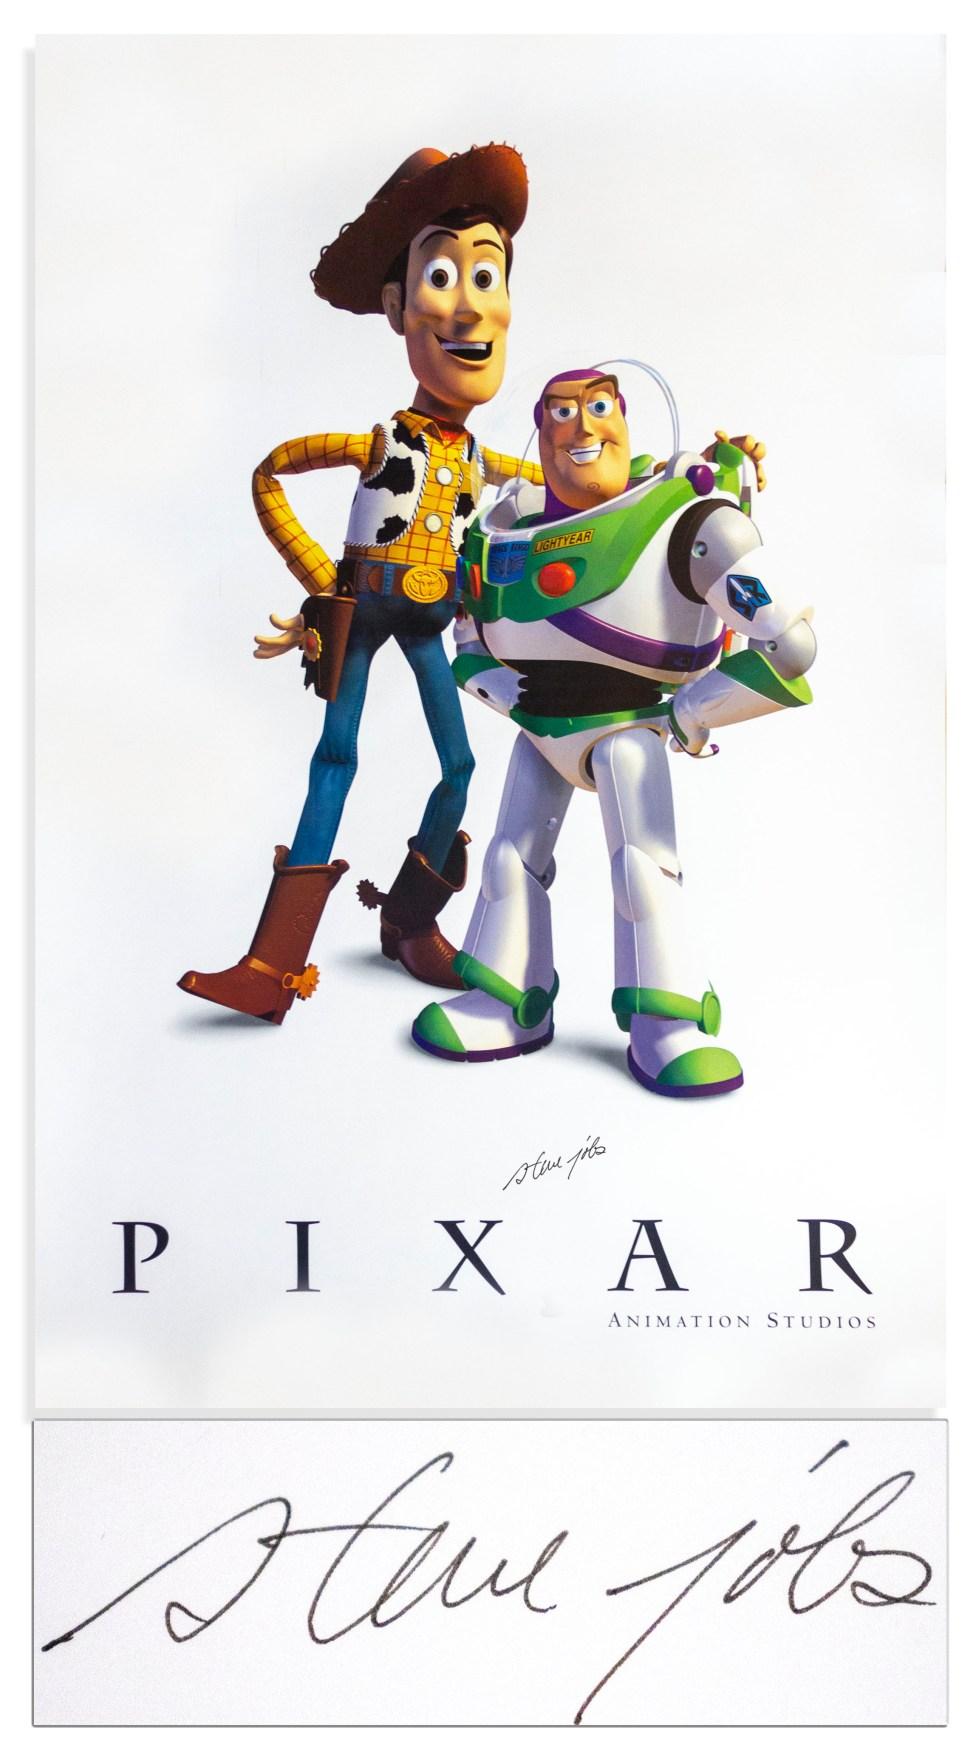 Steve Jobs Pixar Toy Story autographed poster